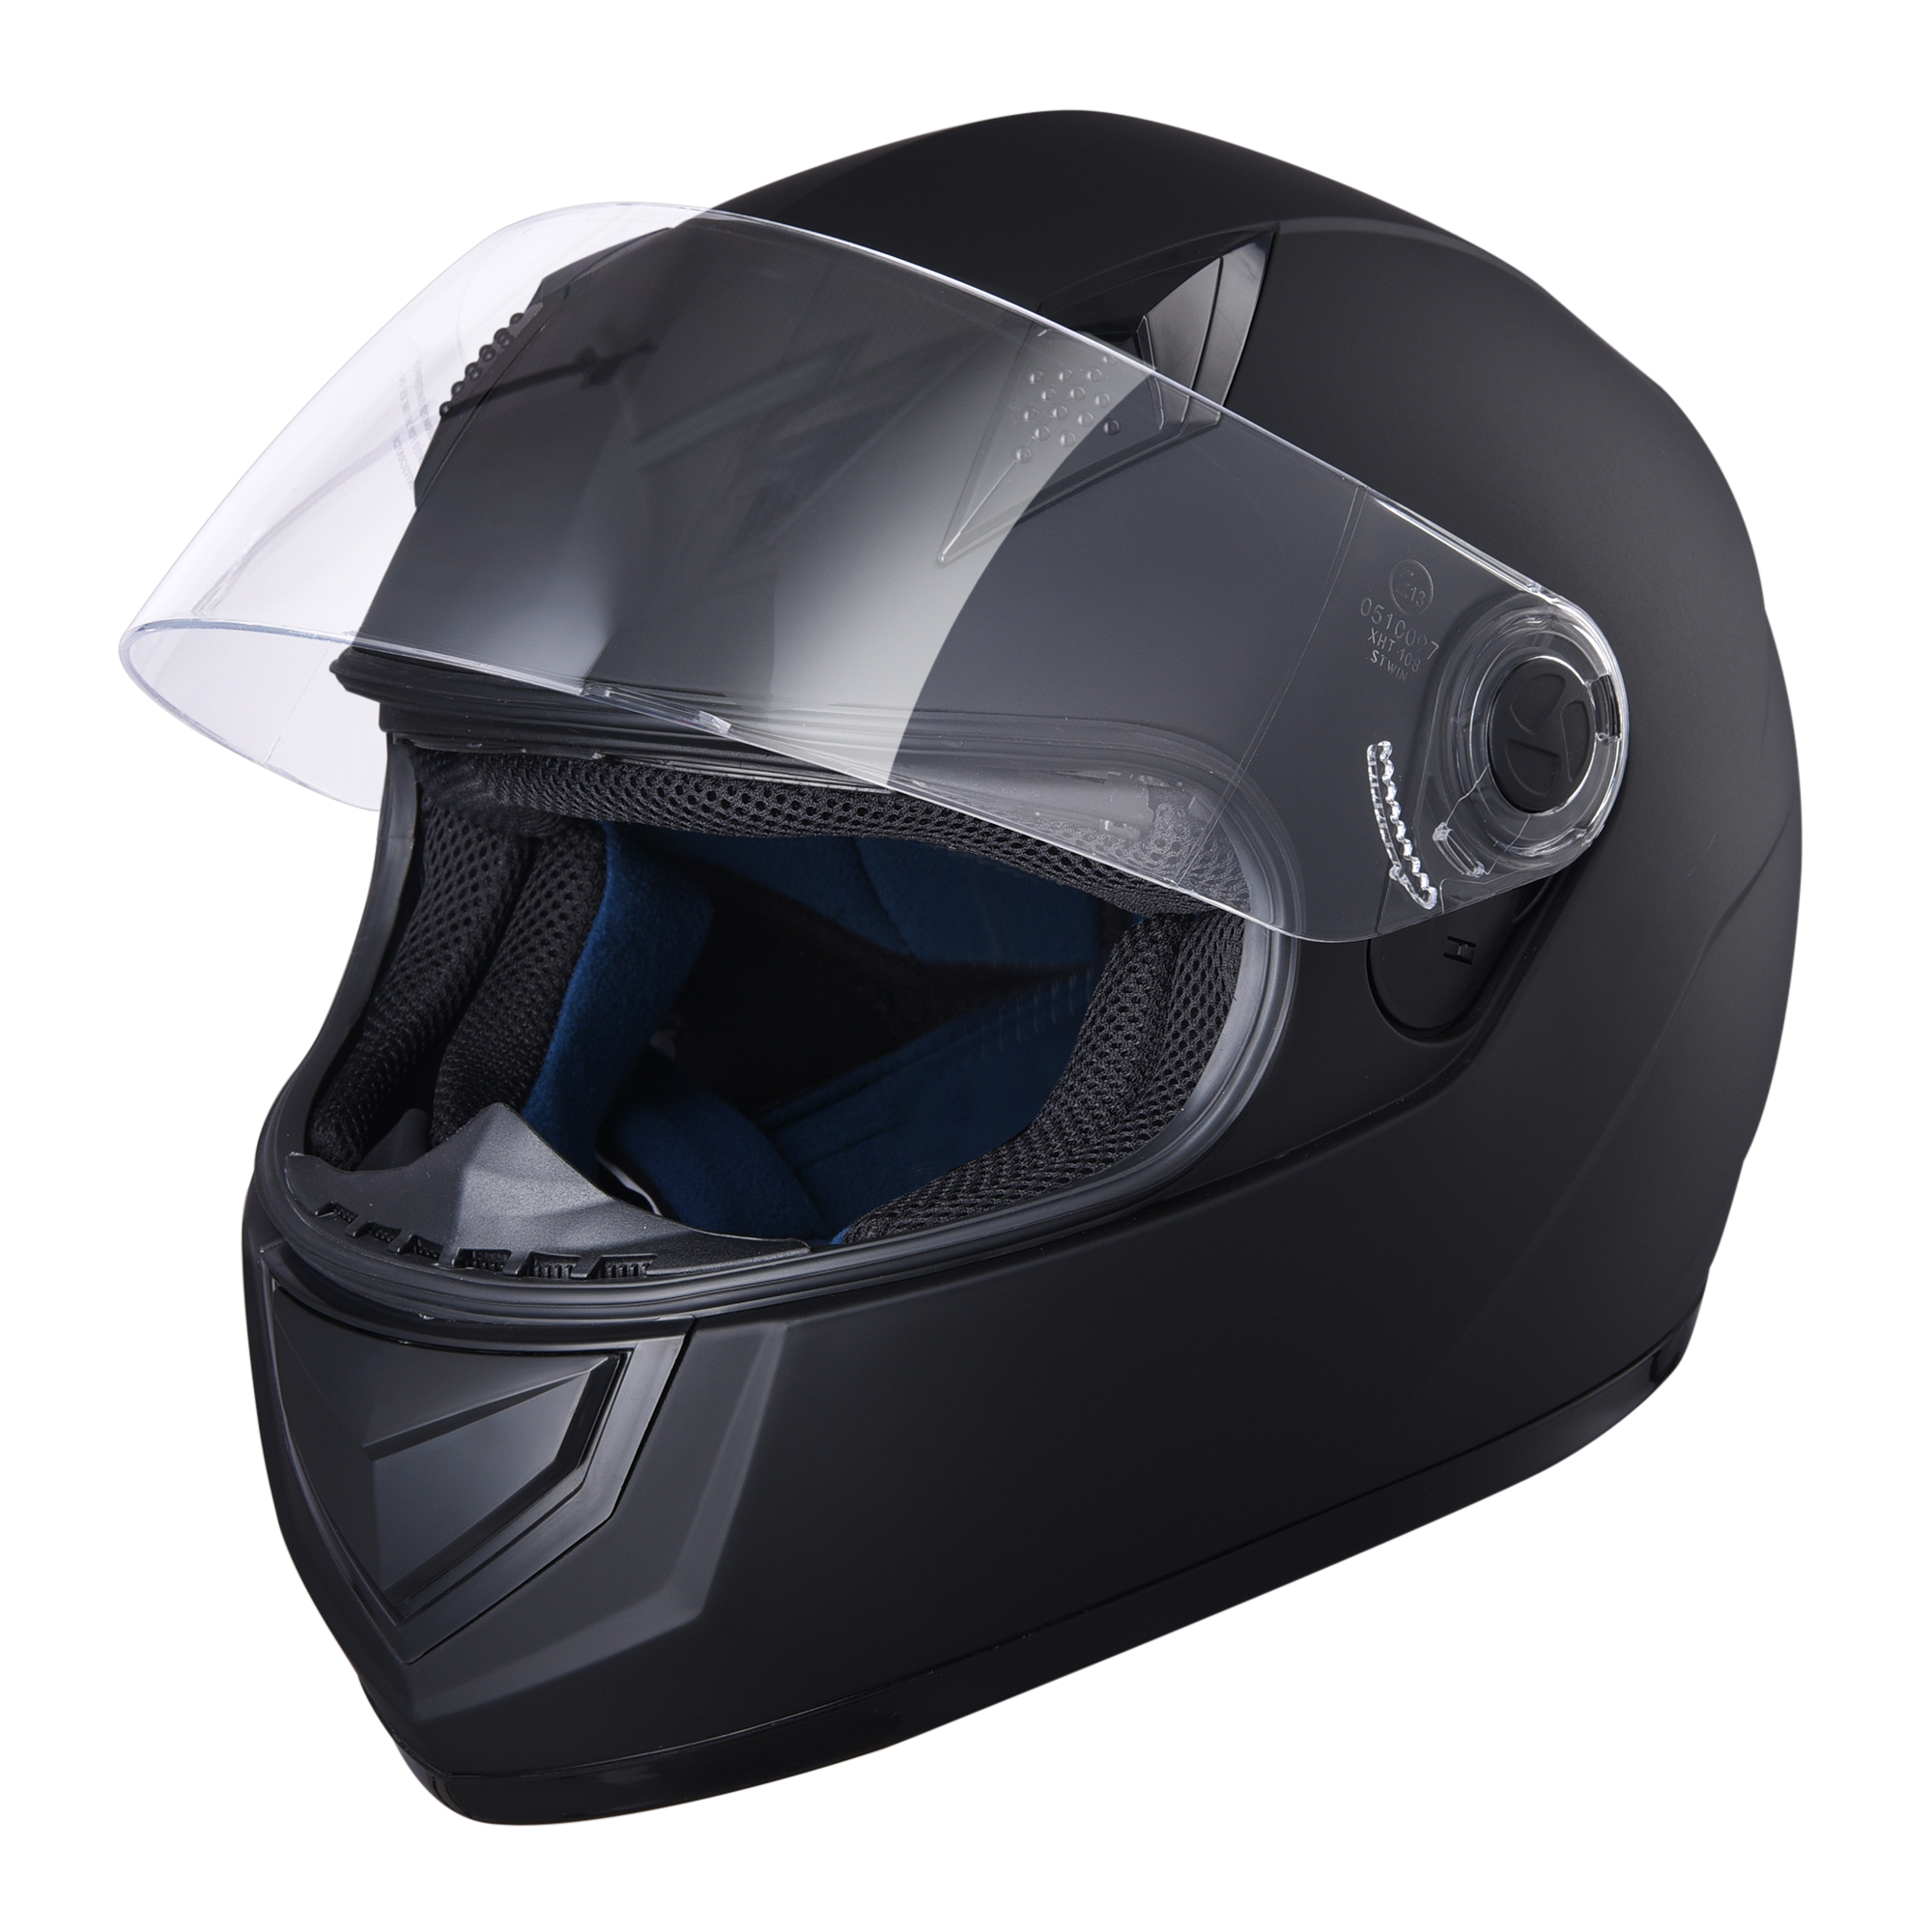 miniature 98 - AHR K12 Full Face Motorcycle Helmet DOT Air Vents Clear Visor Racing S M L XL